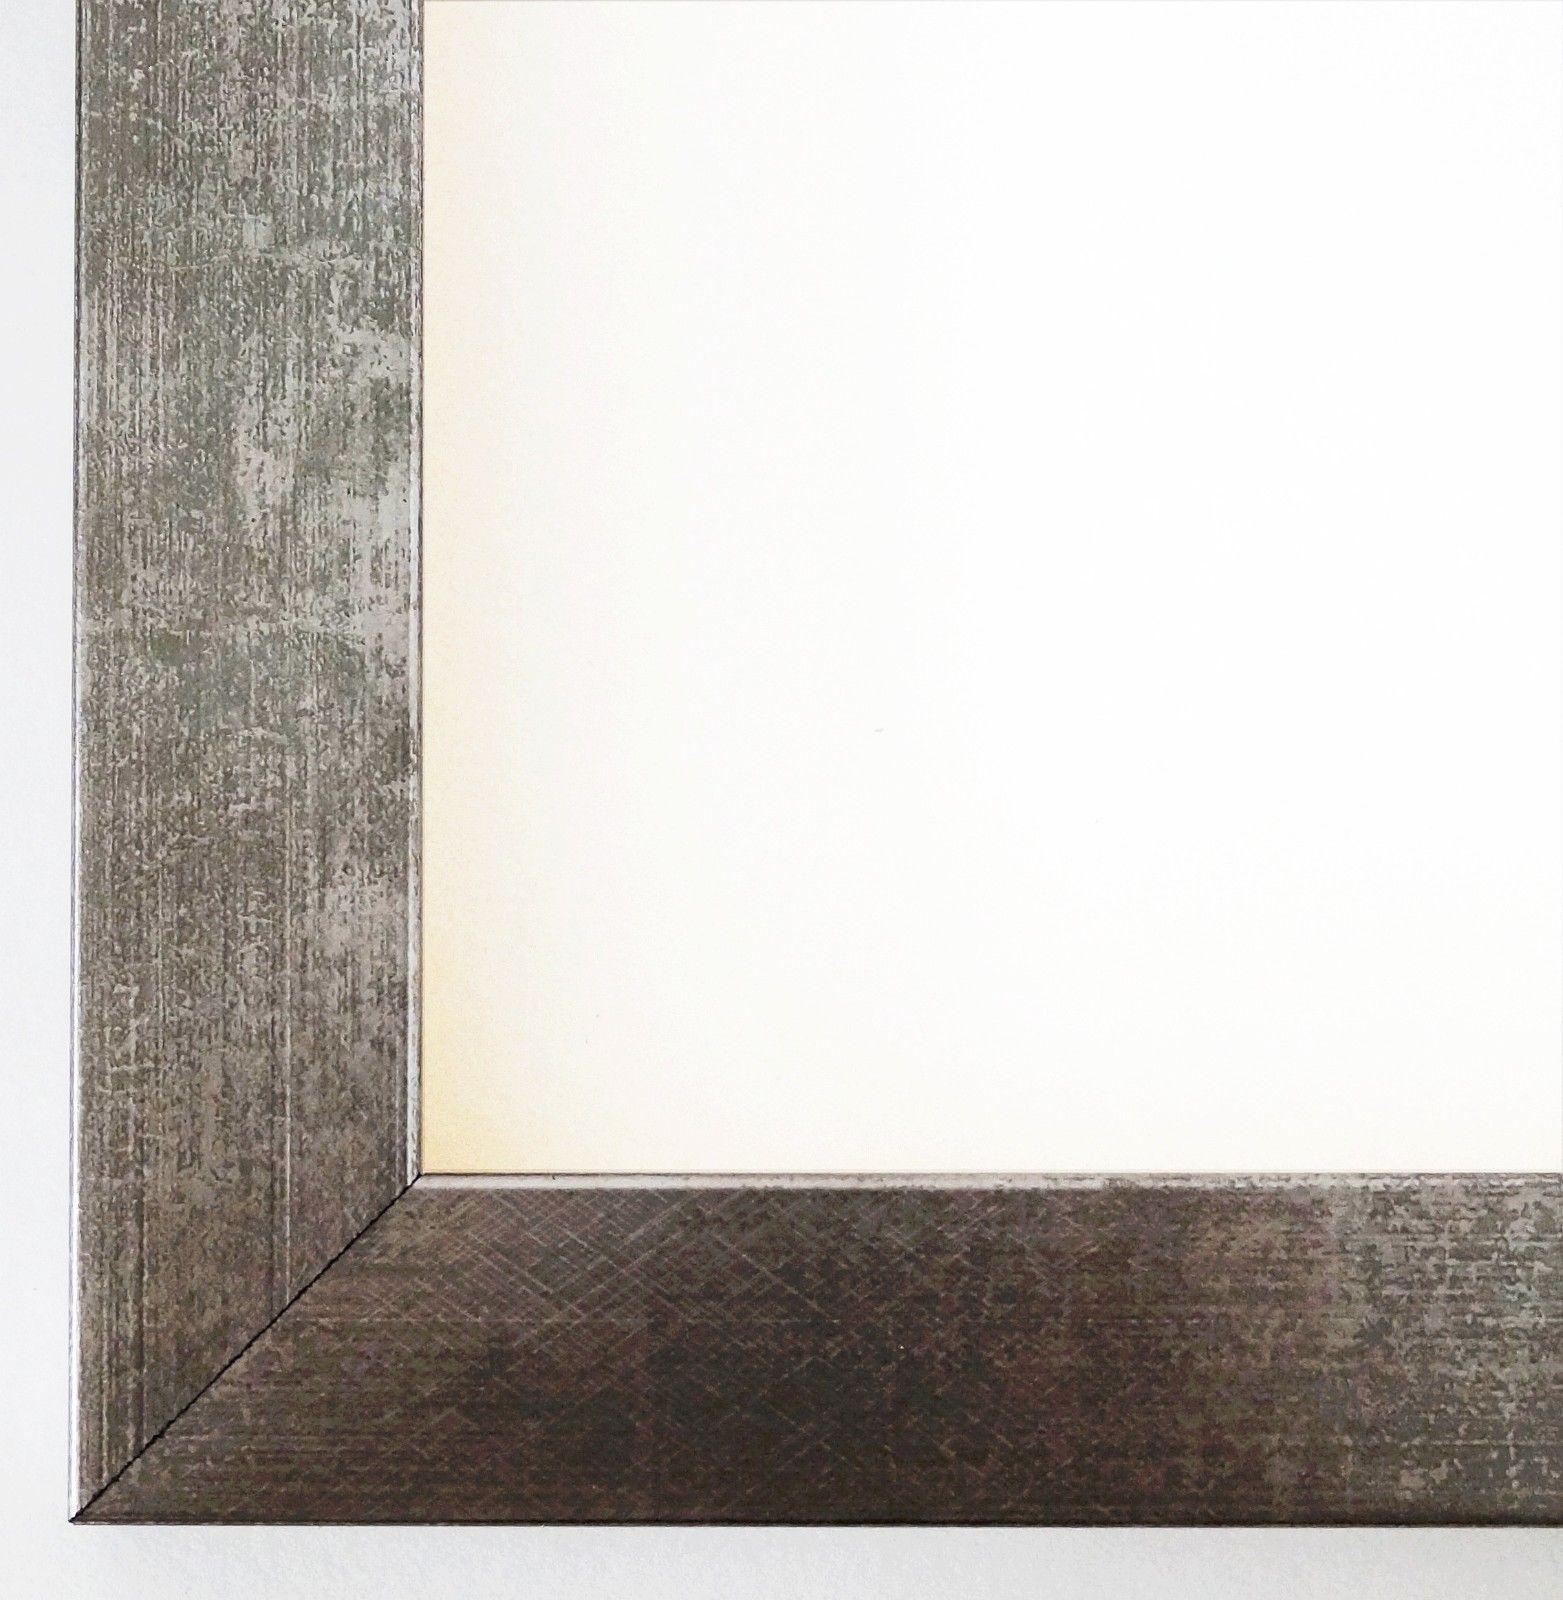 Bilderrahmen Silber Wolfsburg - 9x13 10x10 10x15 13x18 15x20 18x24 ...